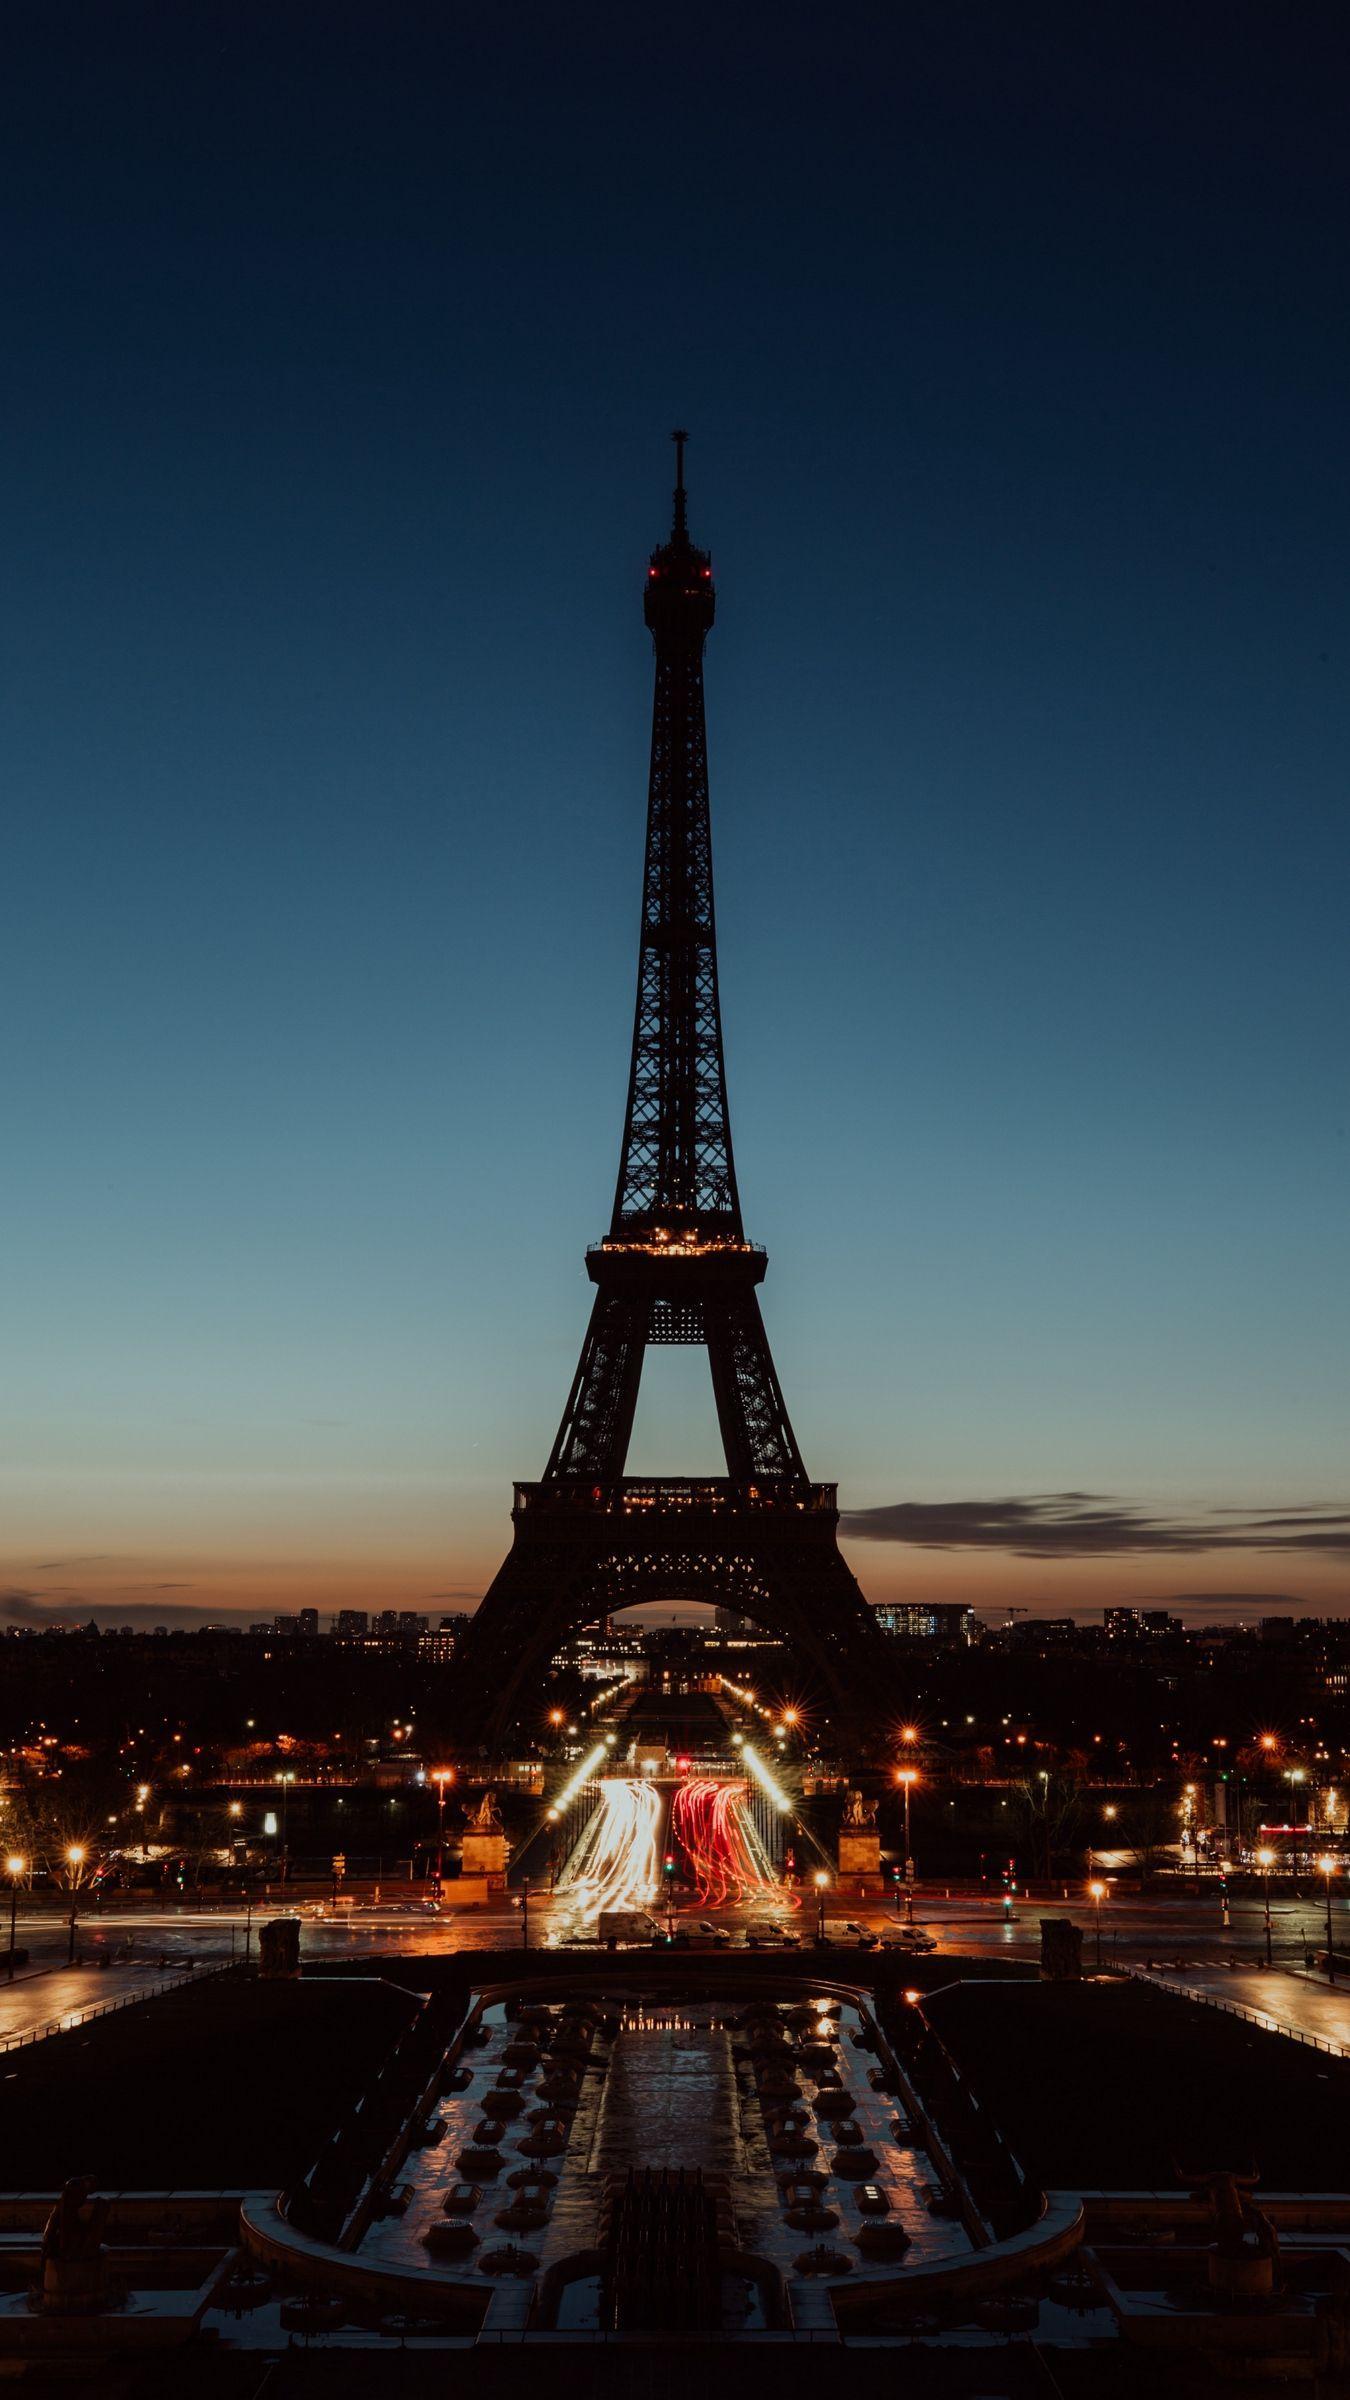 Night Paris Iphone Wallpapers Top Free Night Paris Iphone Backgrounds Wallpaperaccess